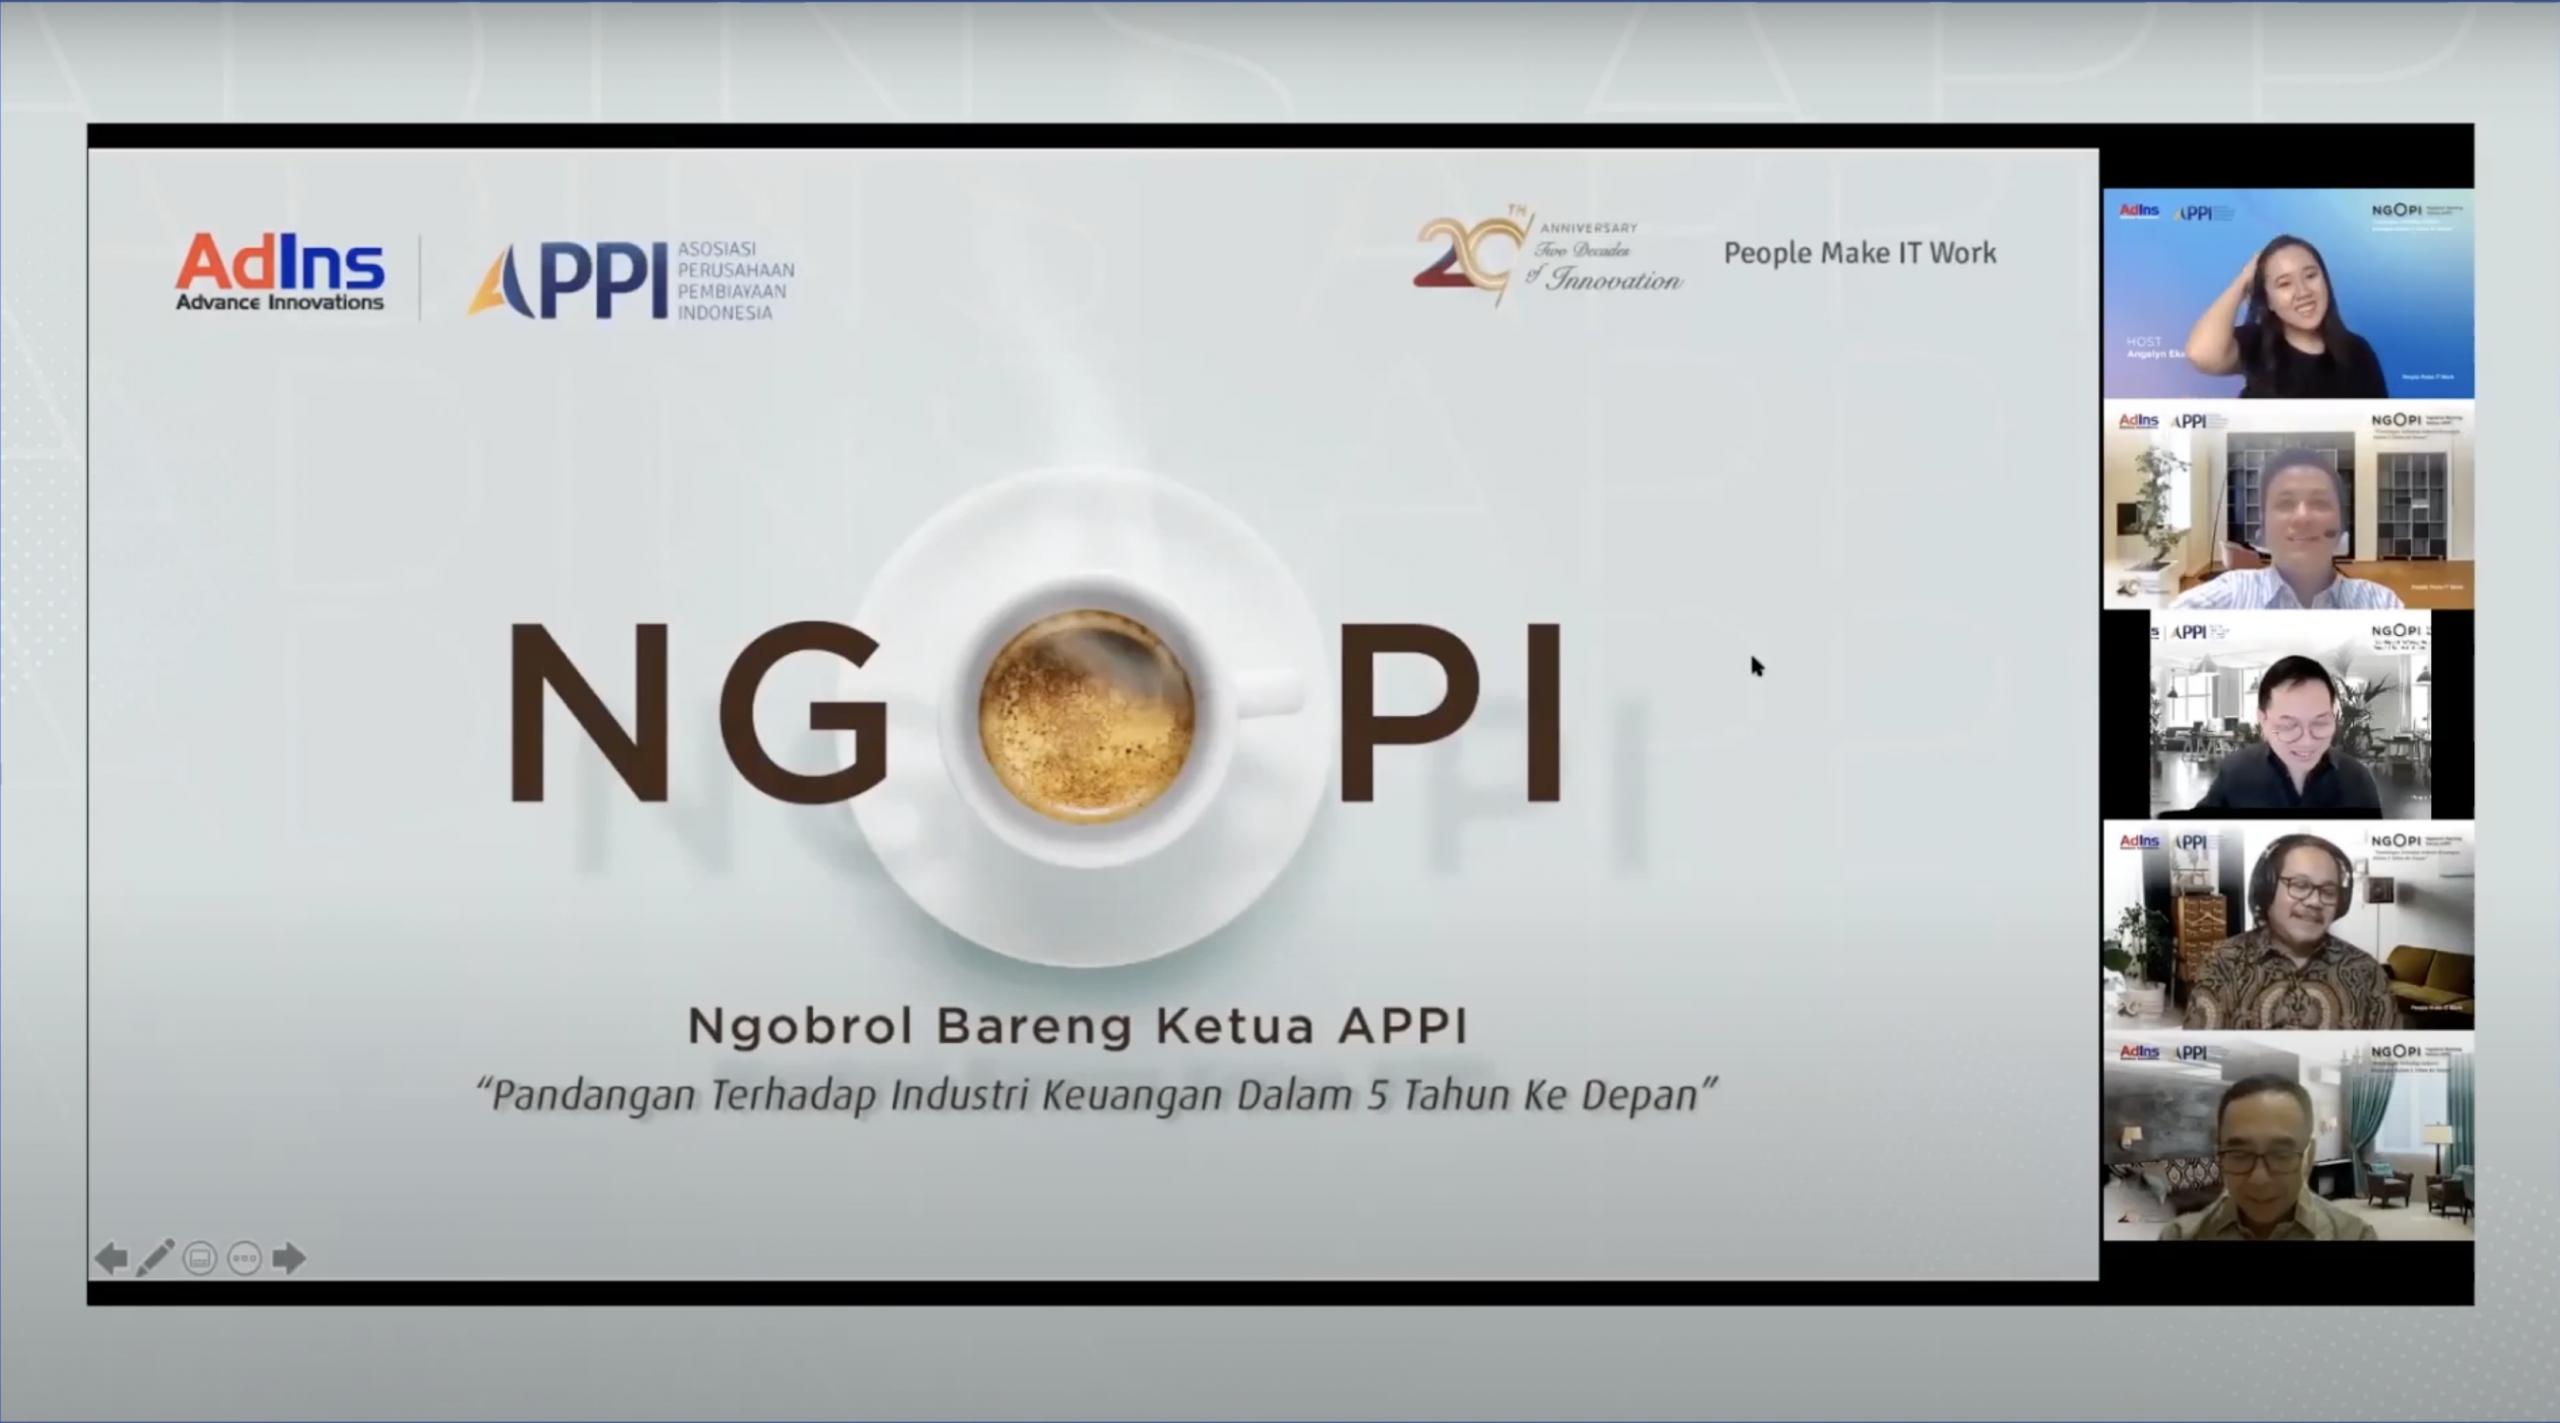 NGOPI –  Ngobrol Bareng Pelaku Industri:  Bersama Bapak Suwandi Wiratno,  Ketua Umum APPI